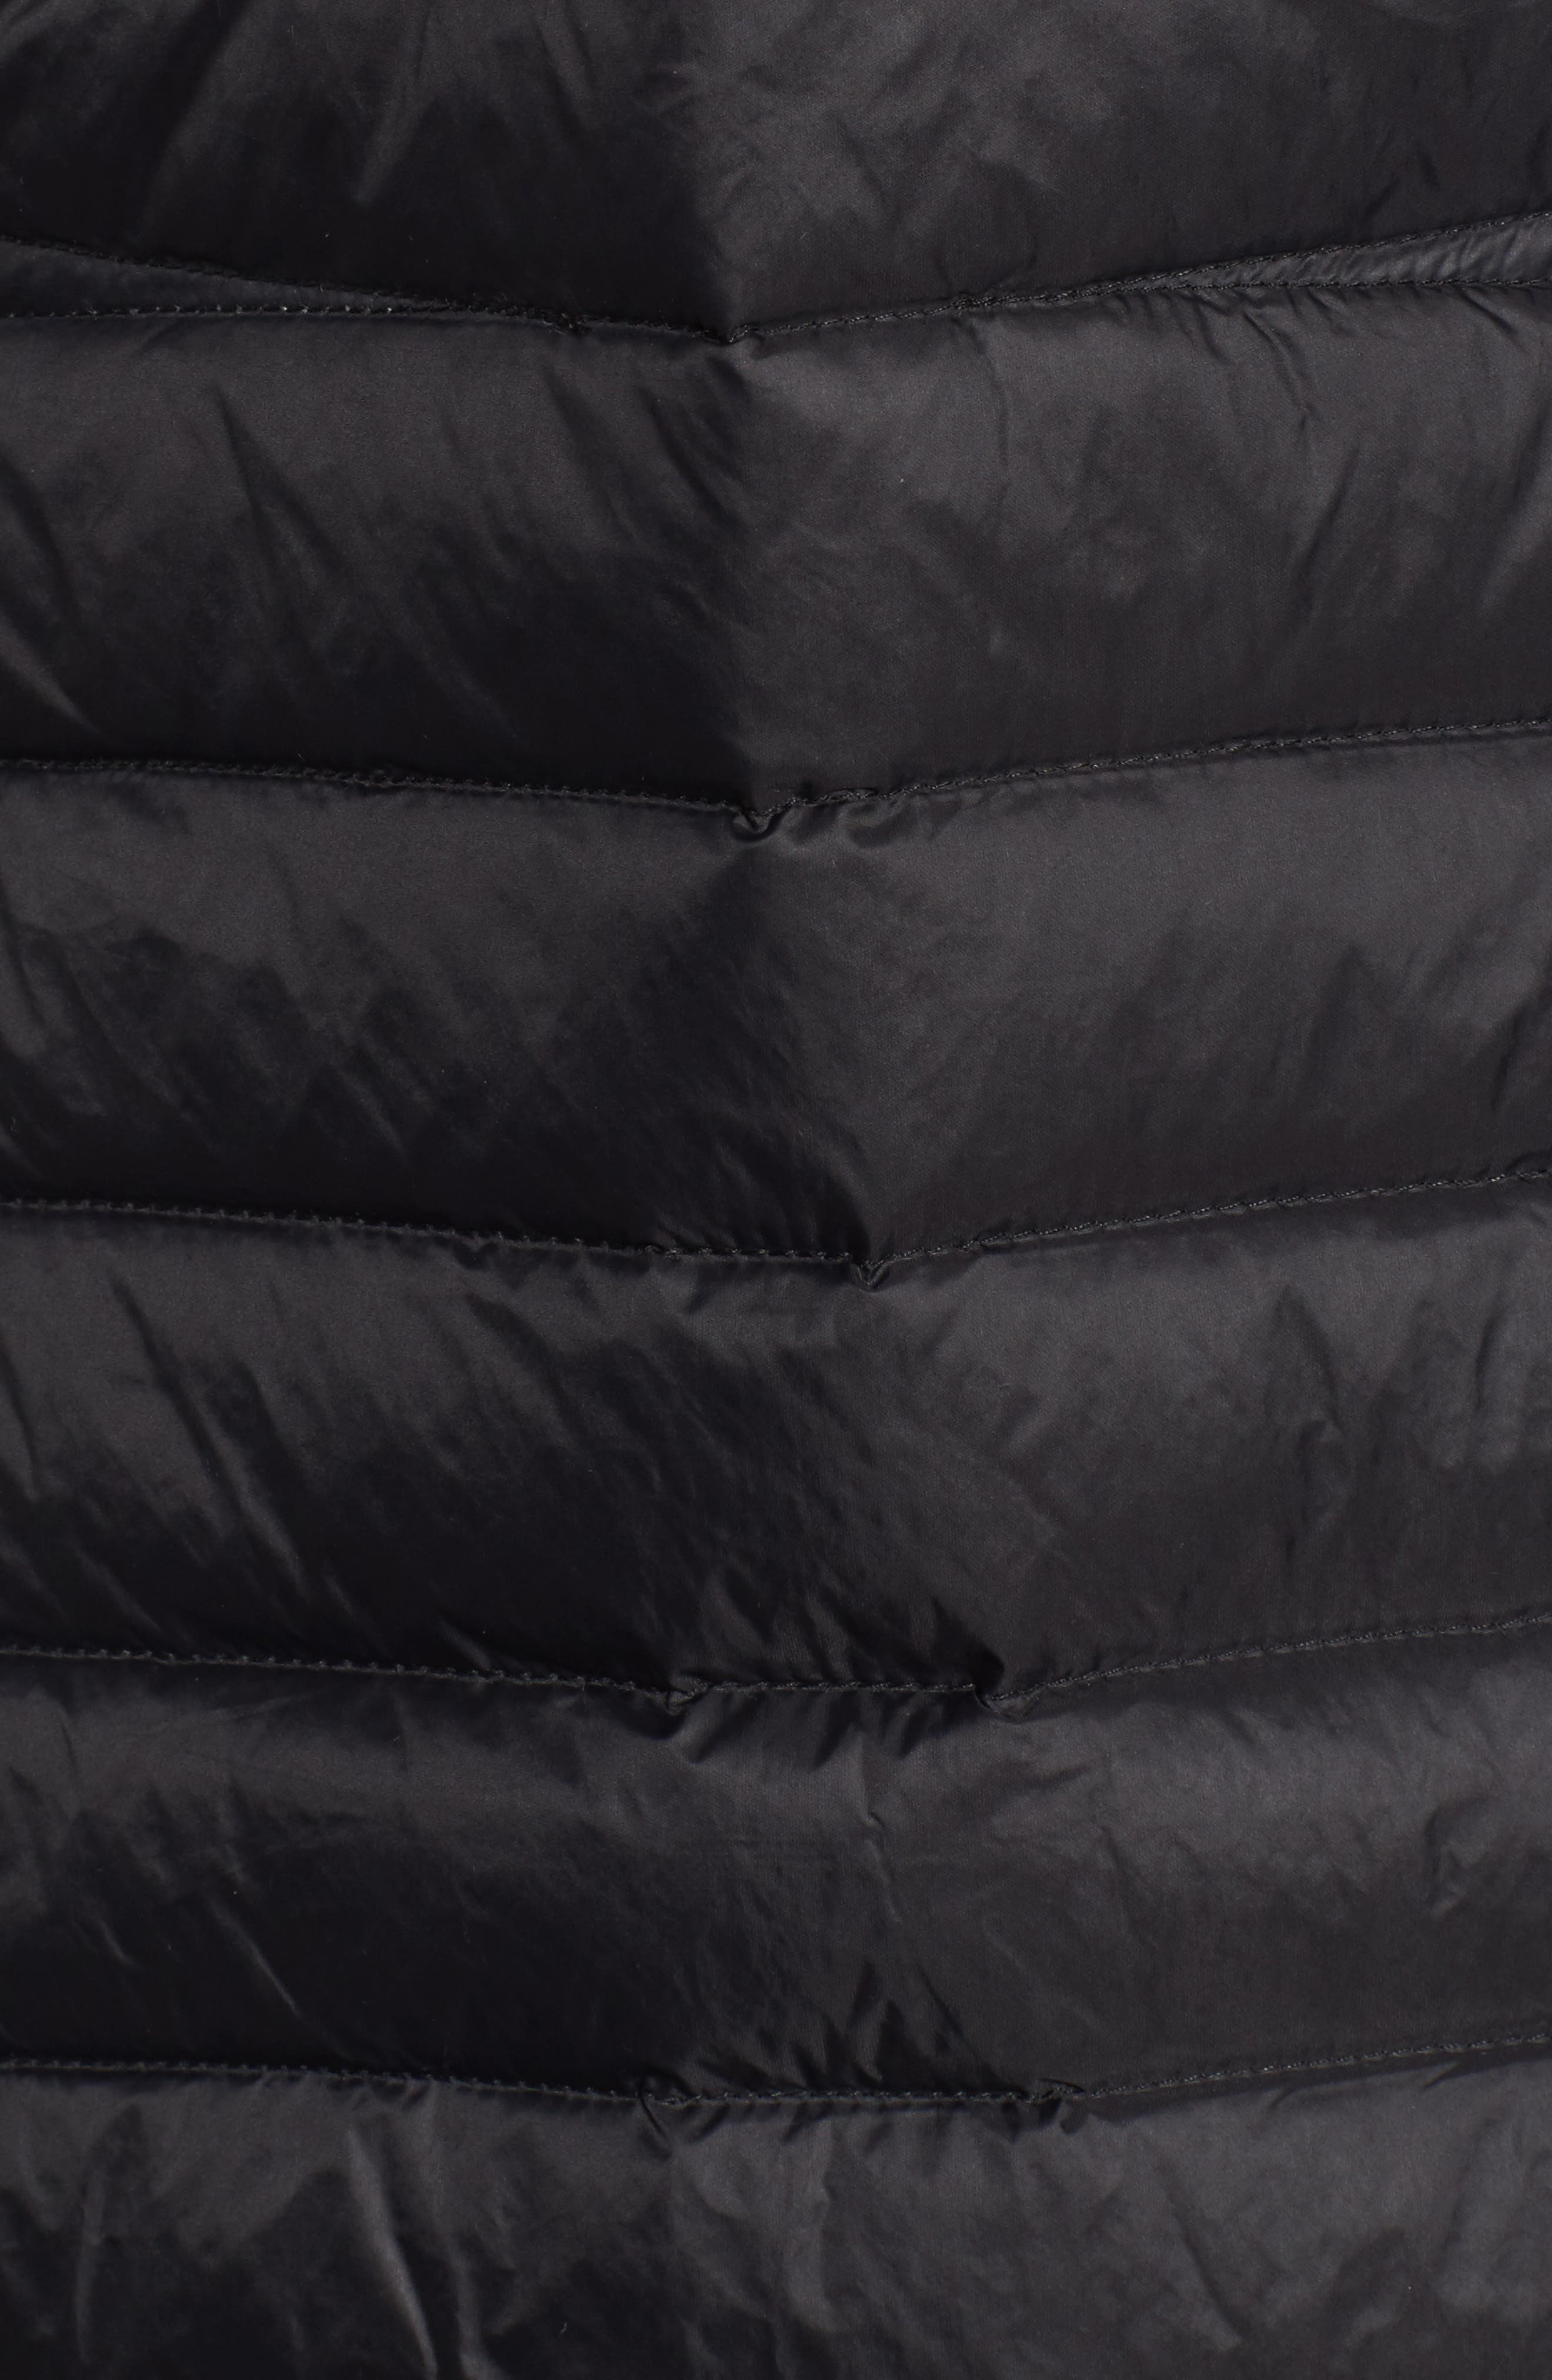 Hooded Down Coat,                             Alternate thumbnail 6, color,                             001